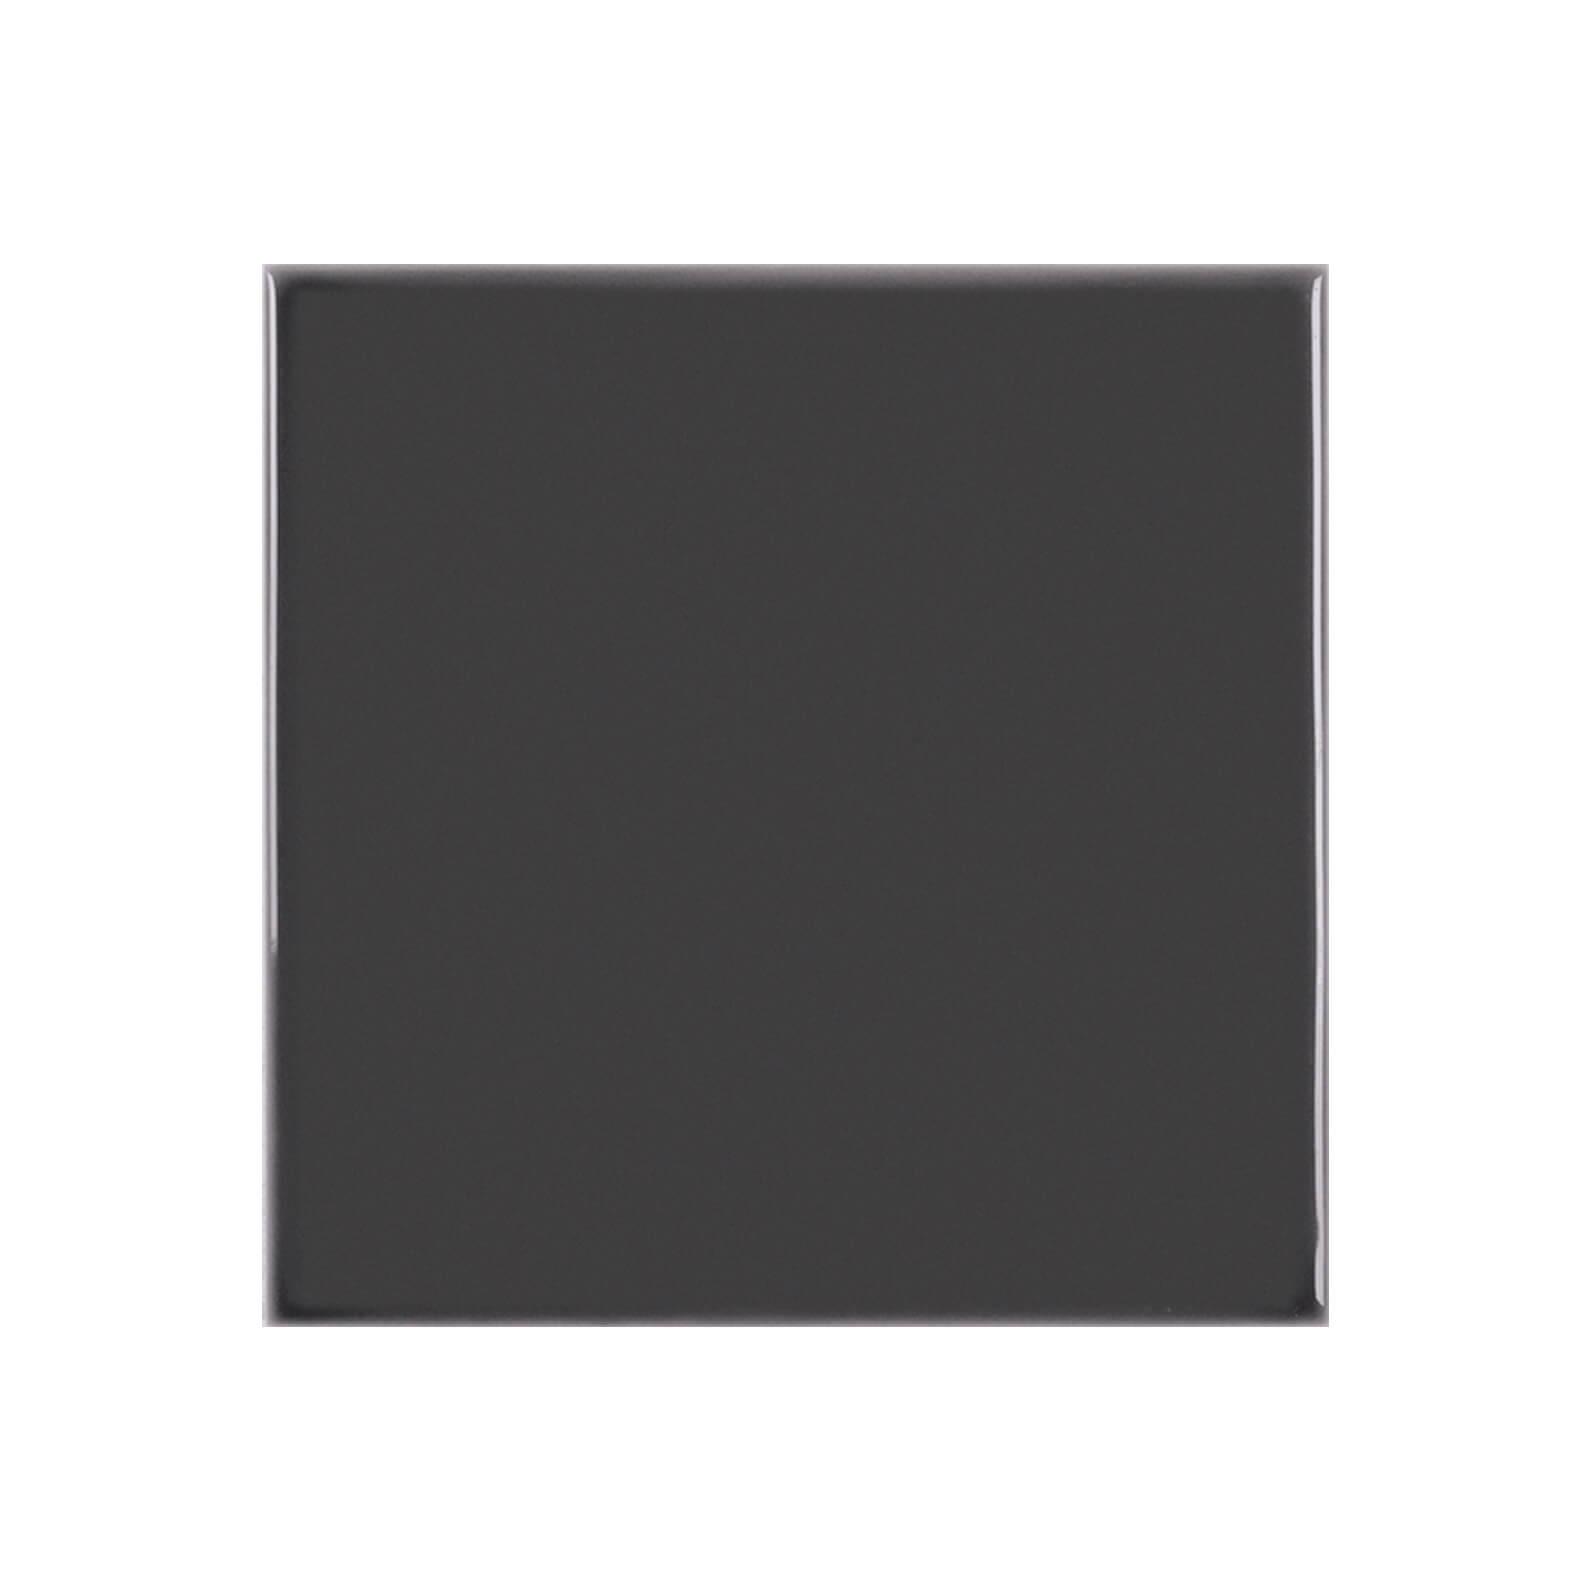 ADST1006 - LISO  - 14.8 cm X 14.8 cm